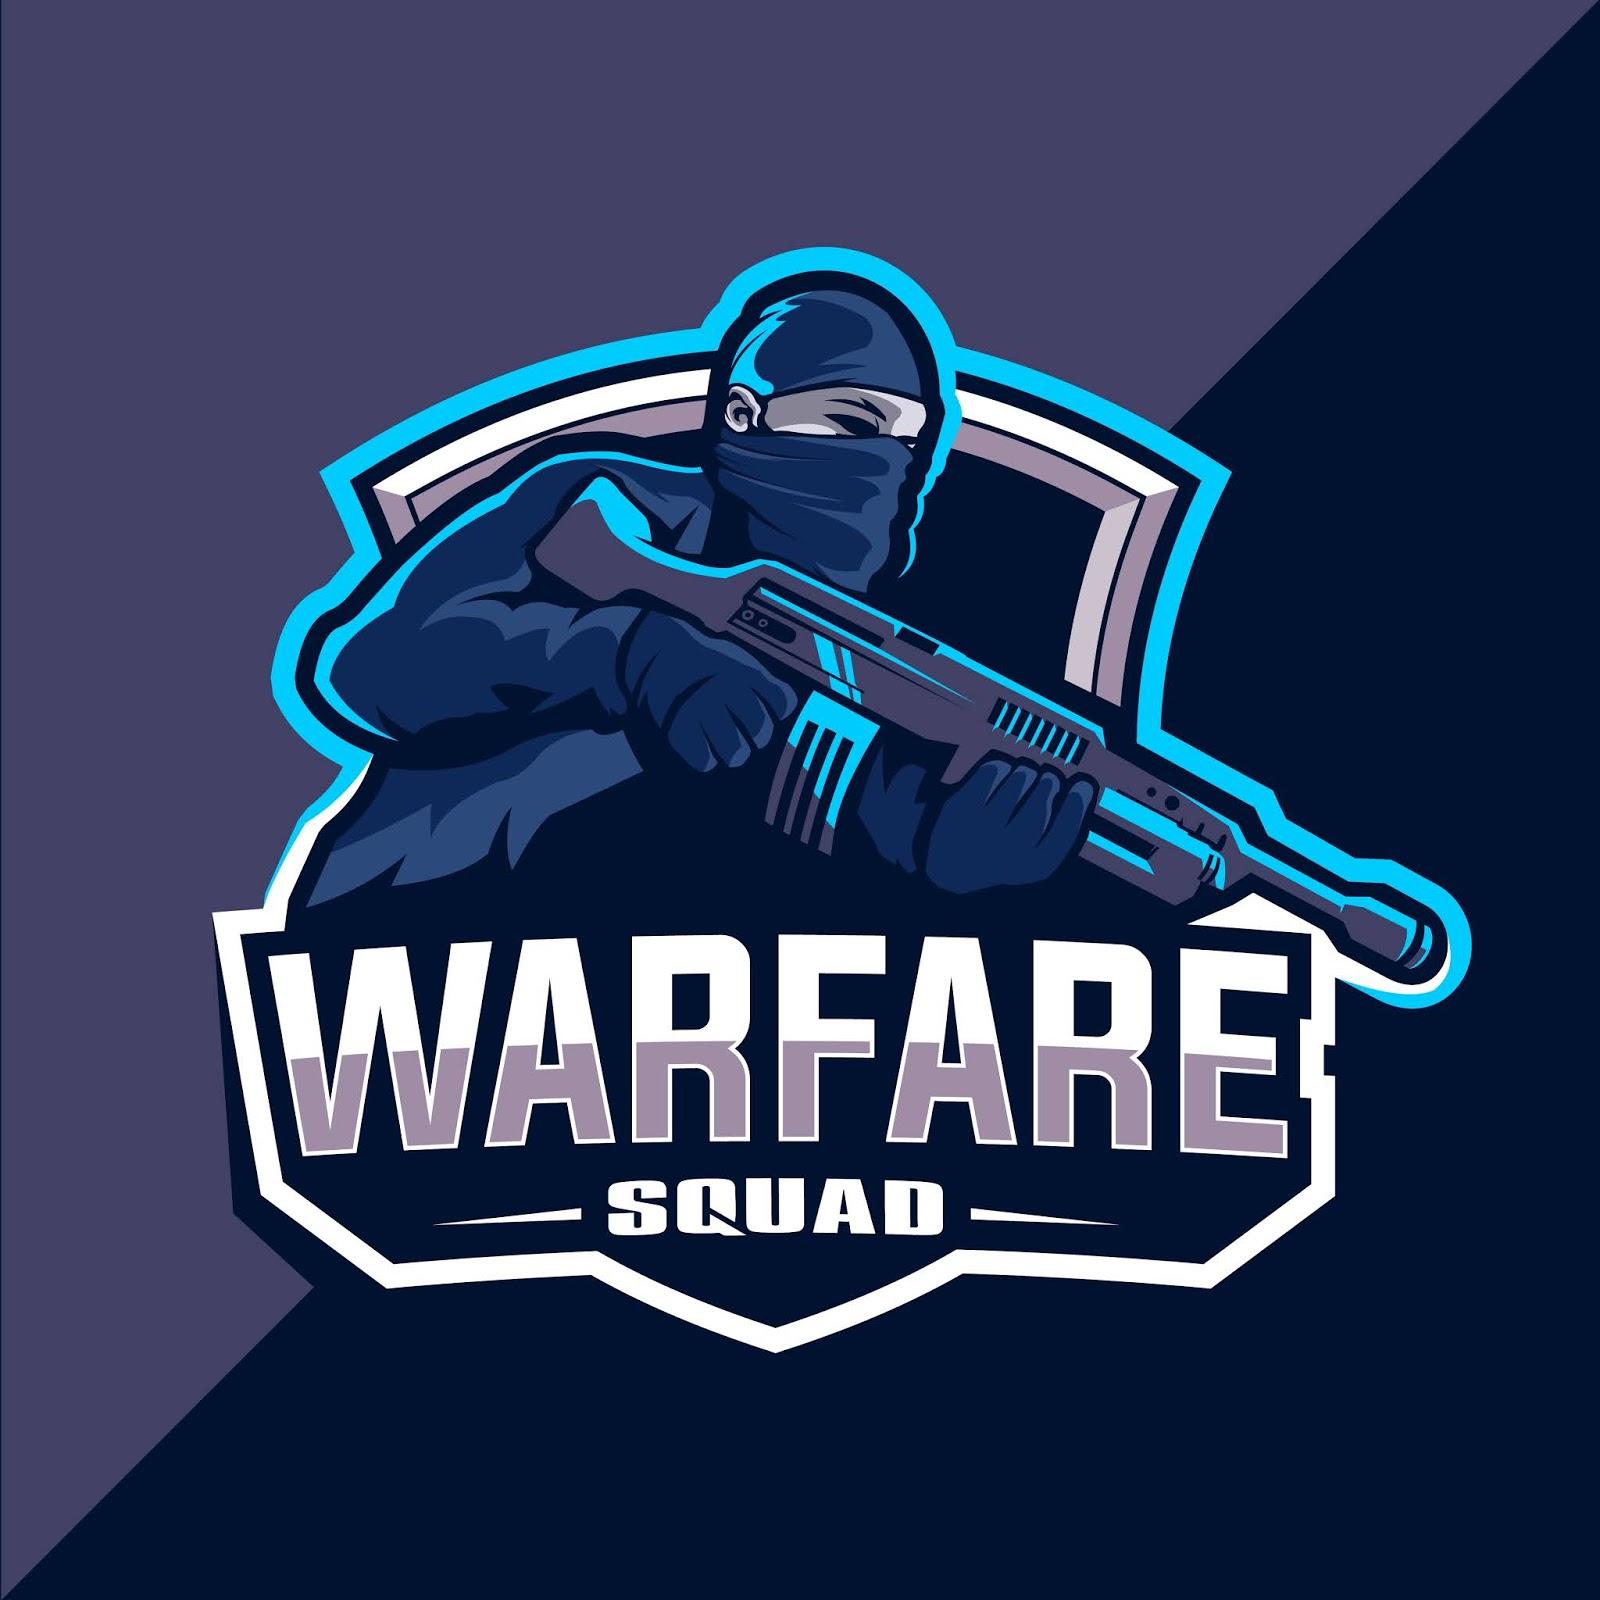 Warfare Squad Esport Logo Design Free Download Vector CDR, AI, EPS and PNG Formats